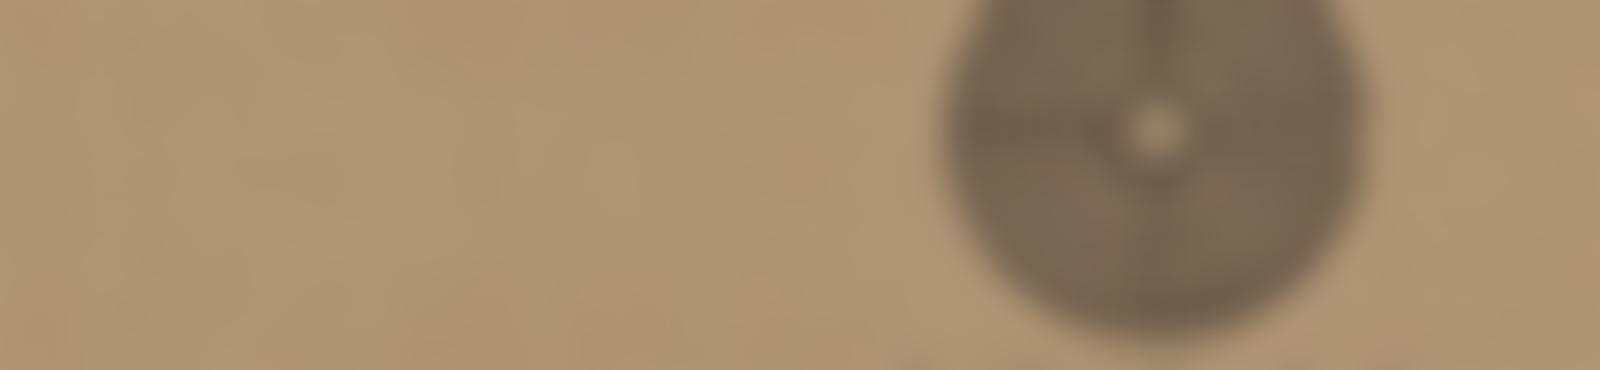 Blurred 949fed8f 7757 42a3 aeb9 bc7ea1c3f5c6